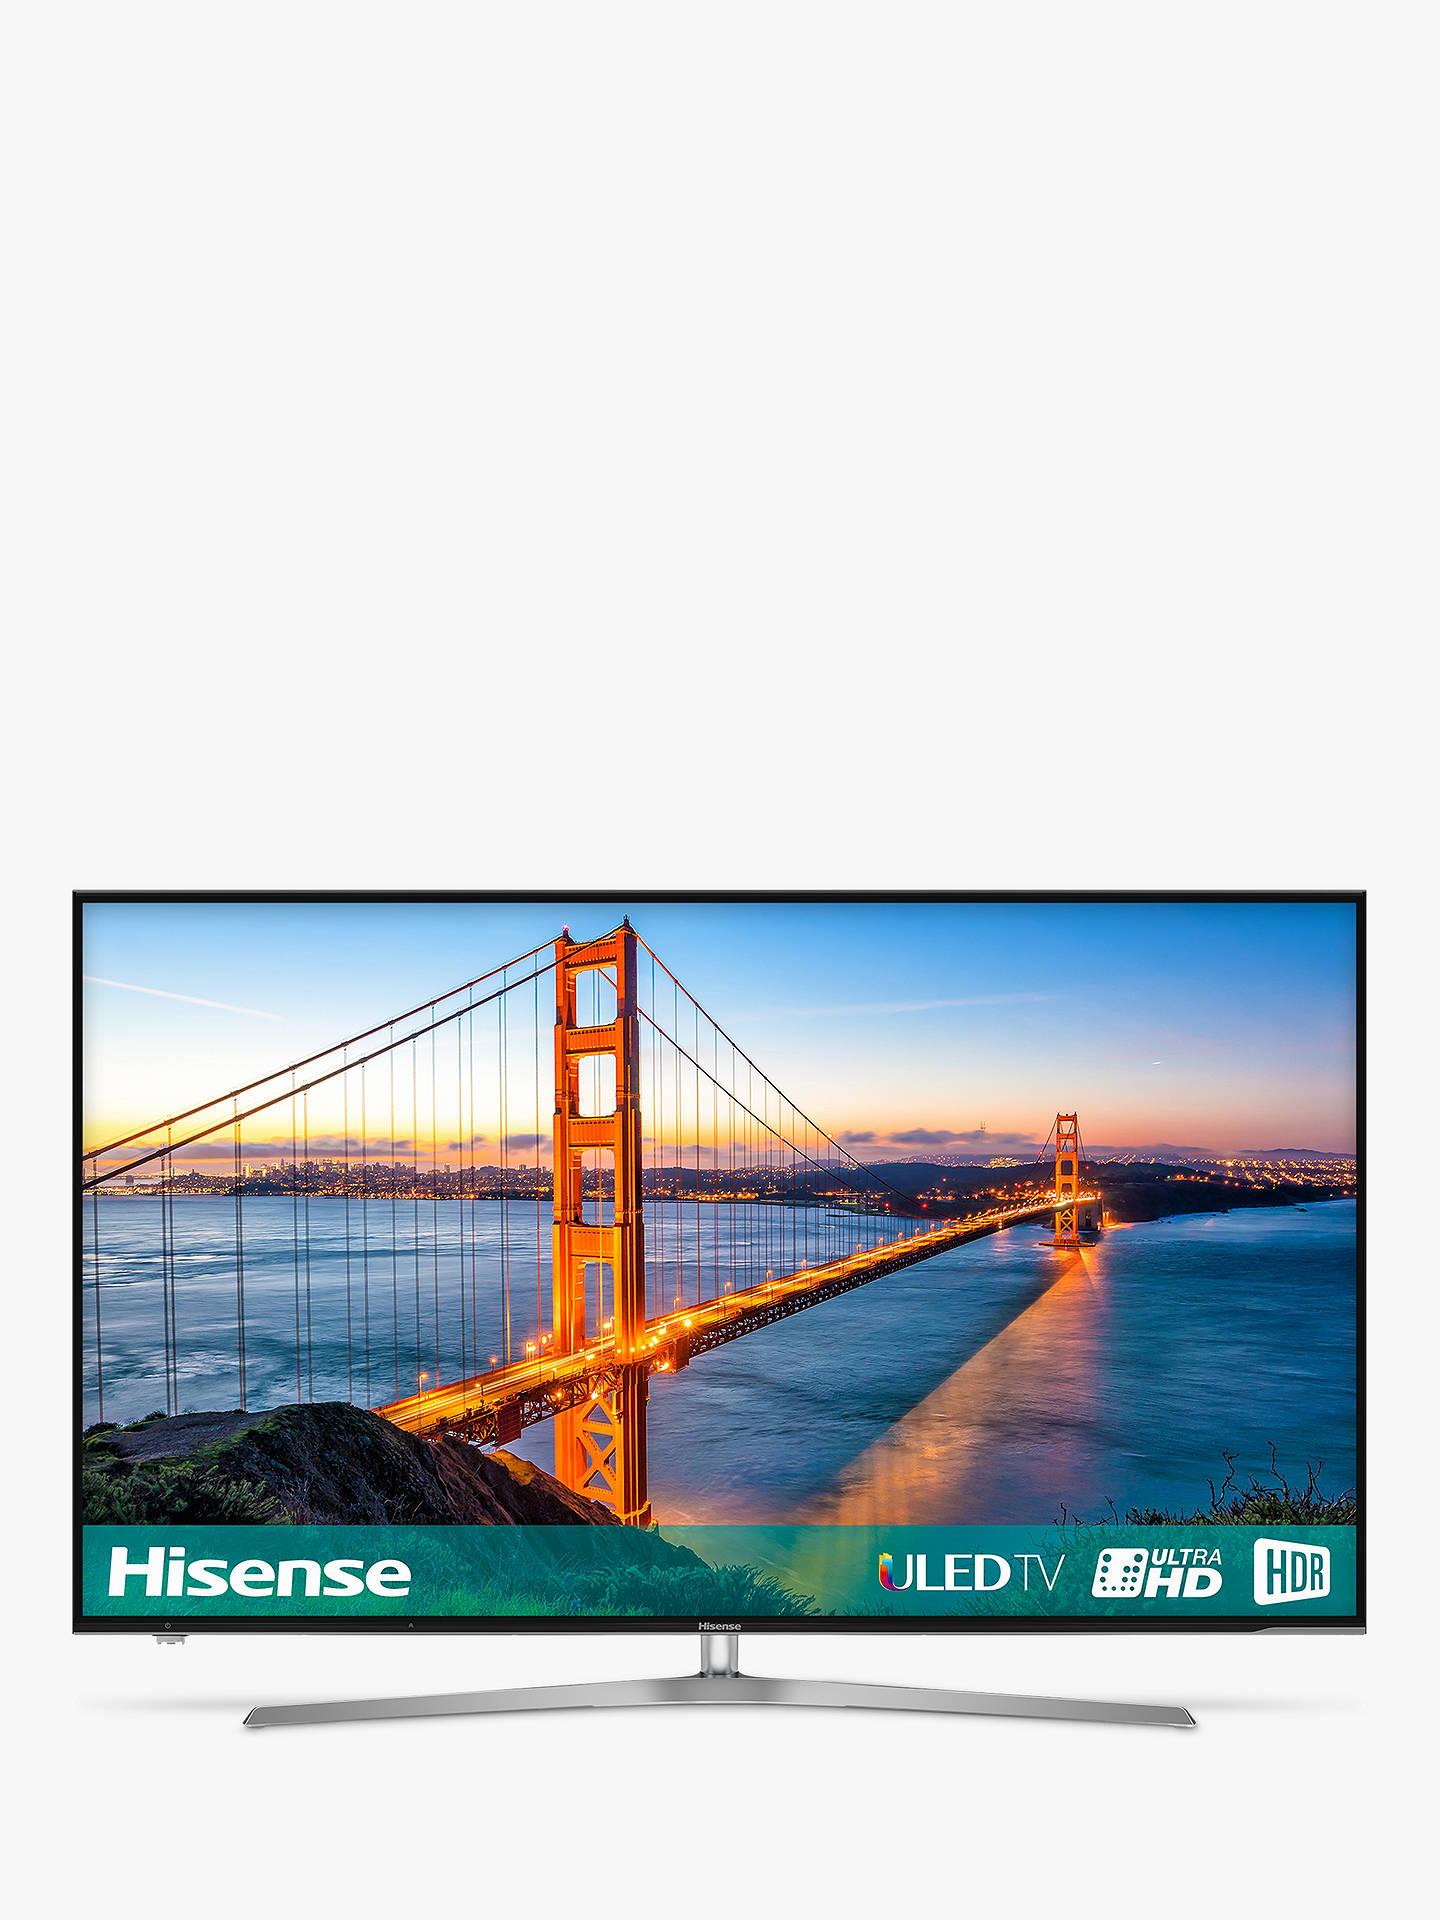 Hisense 55U7A ULED HDR 4K Ultra HD Smart TV, 55